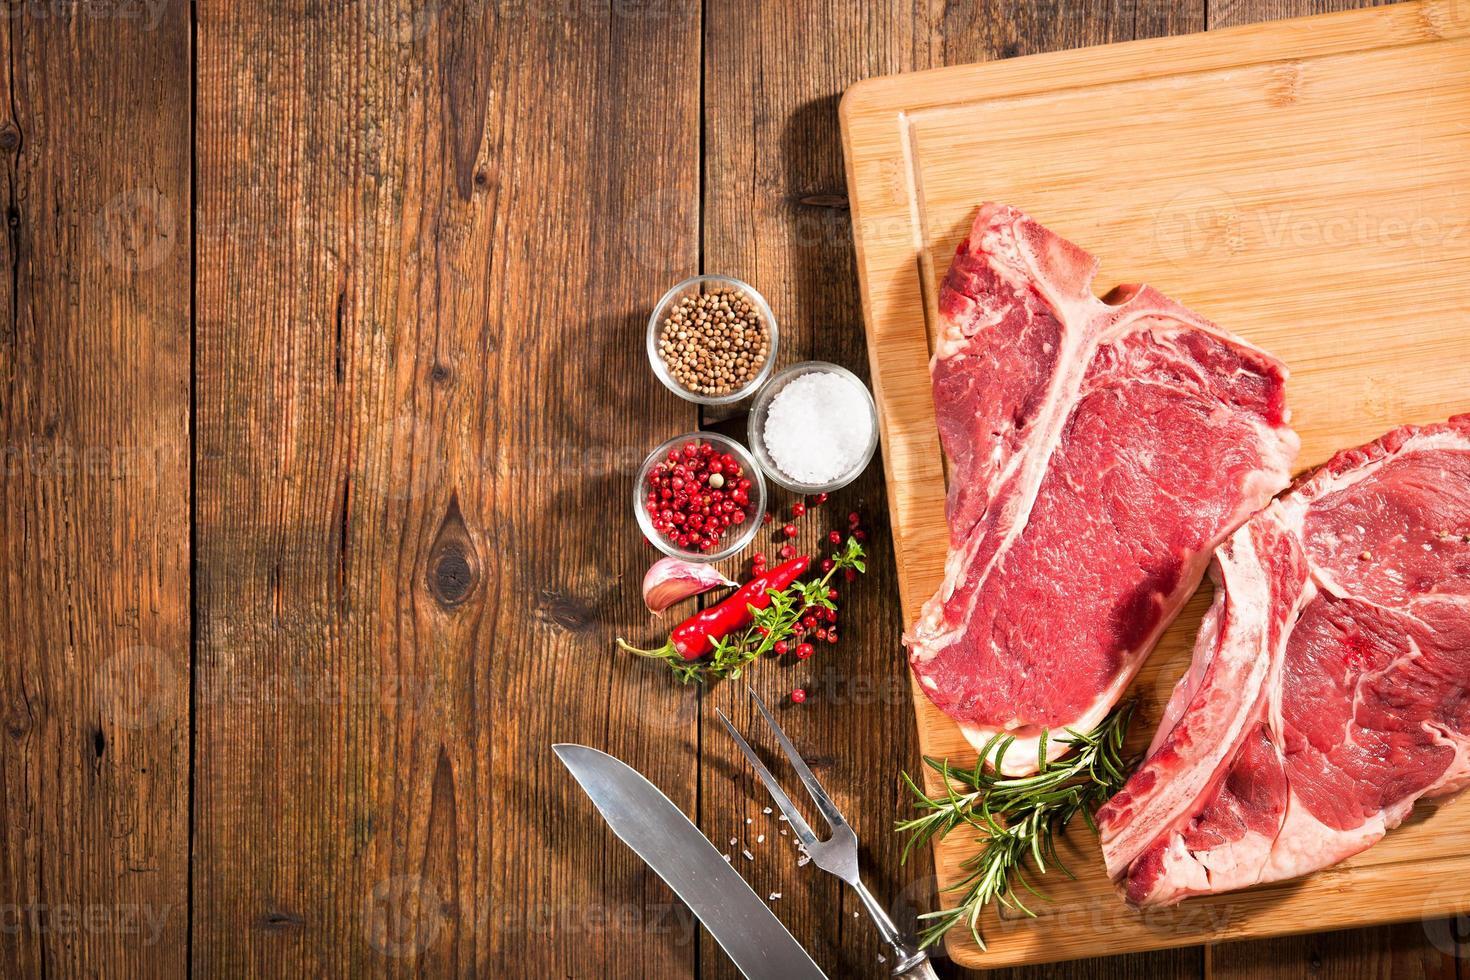 filetes de carne cruda fresca foto